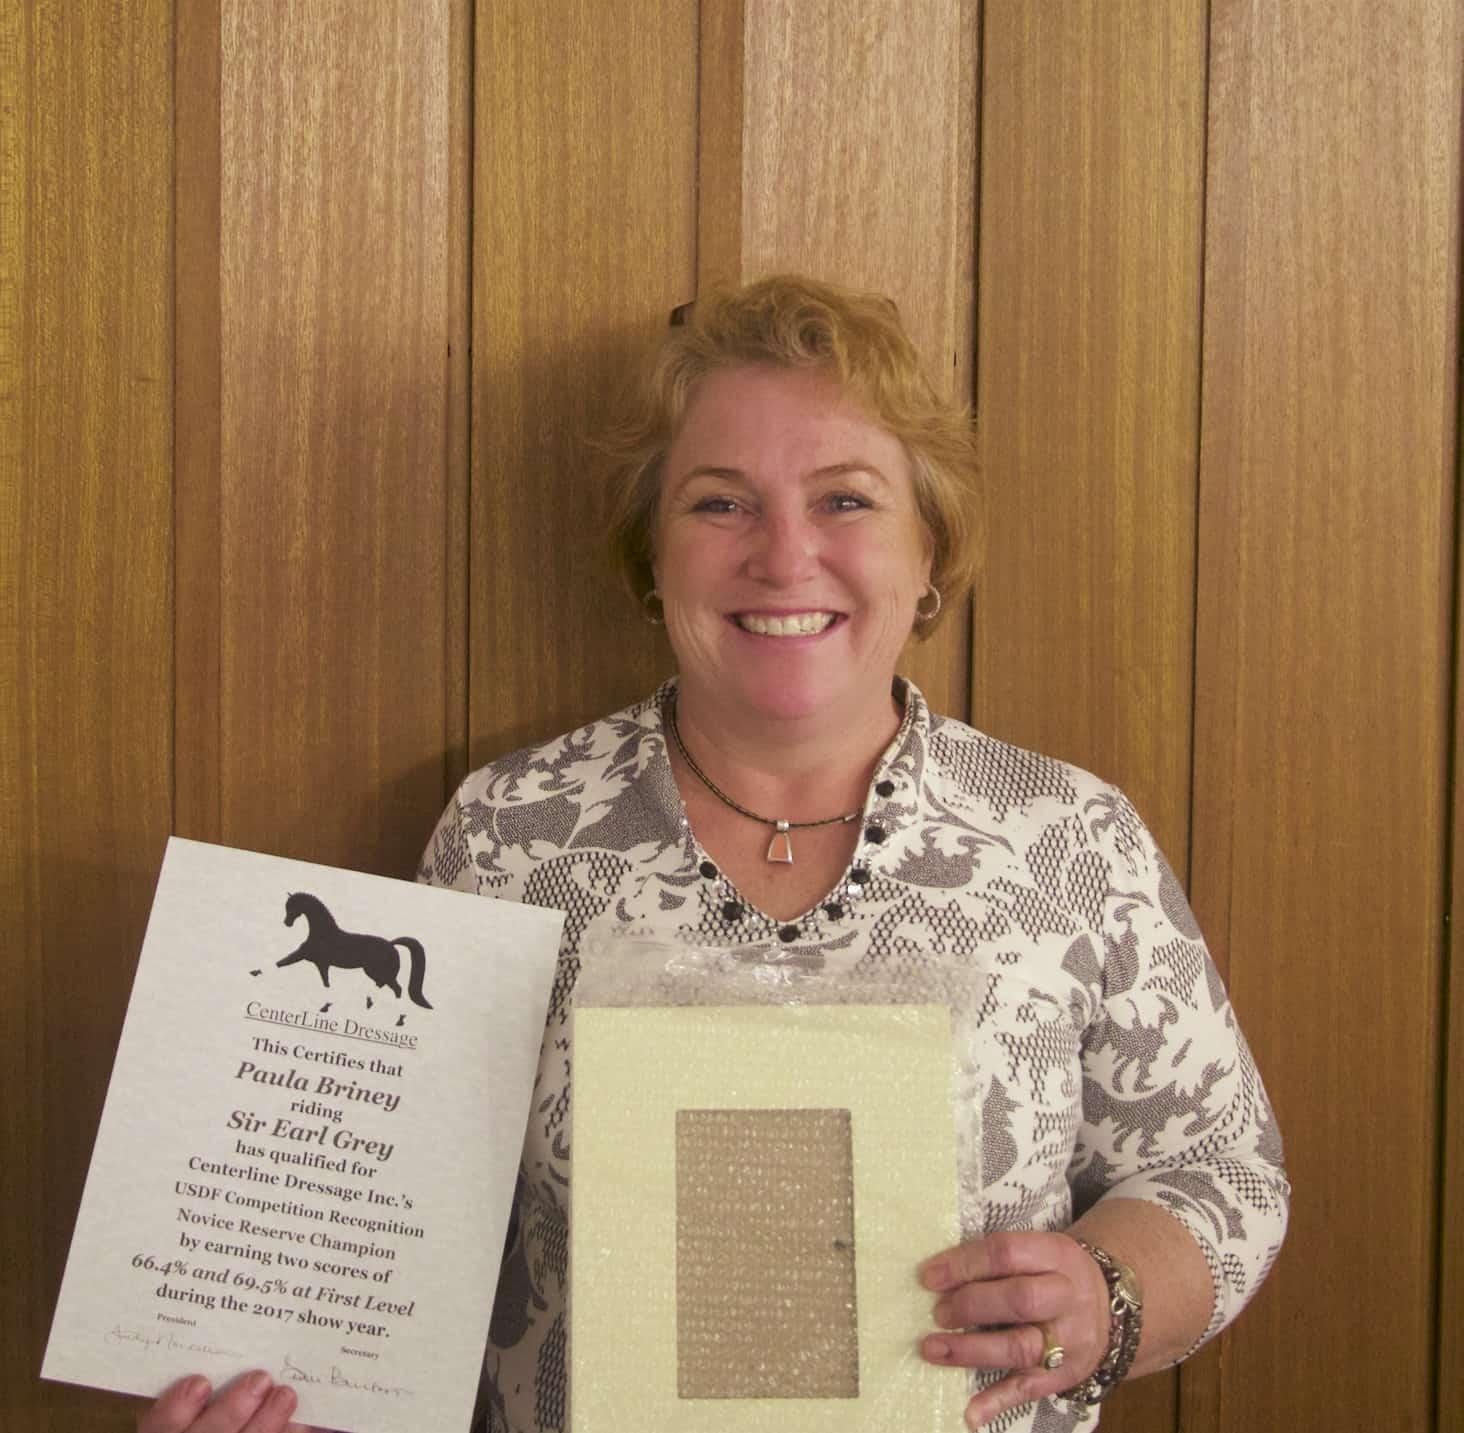 Paula Briney accepts an award